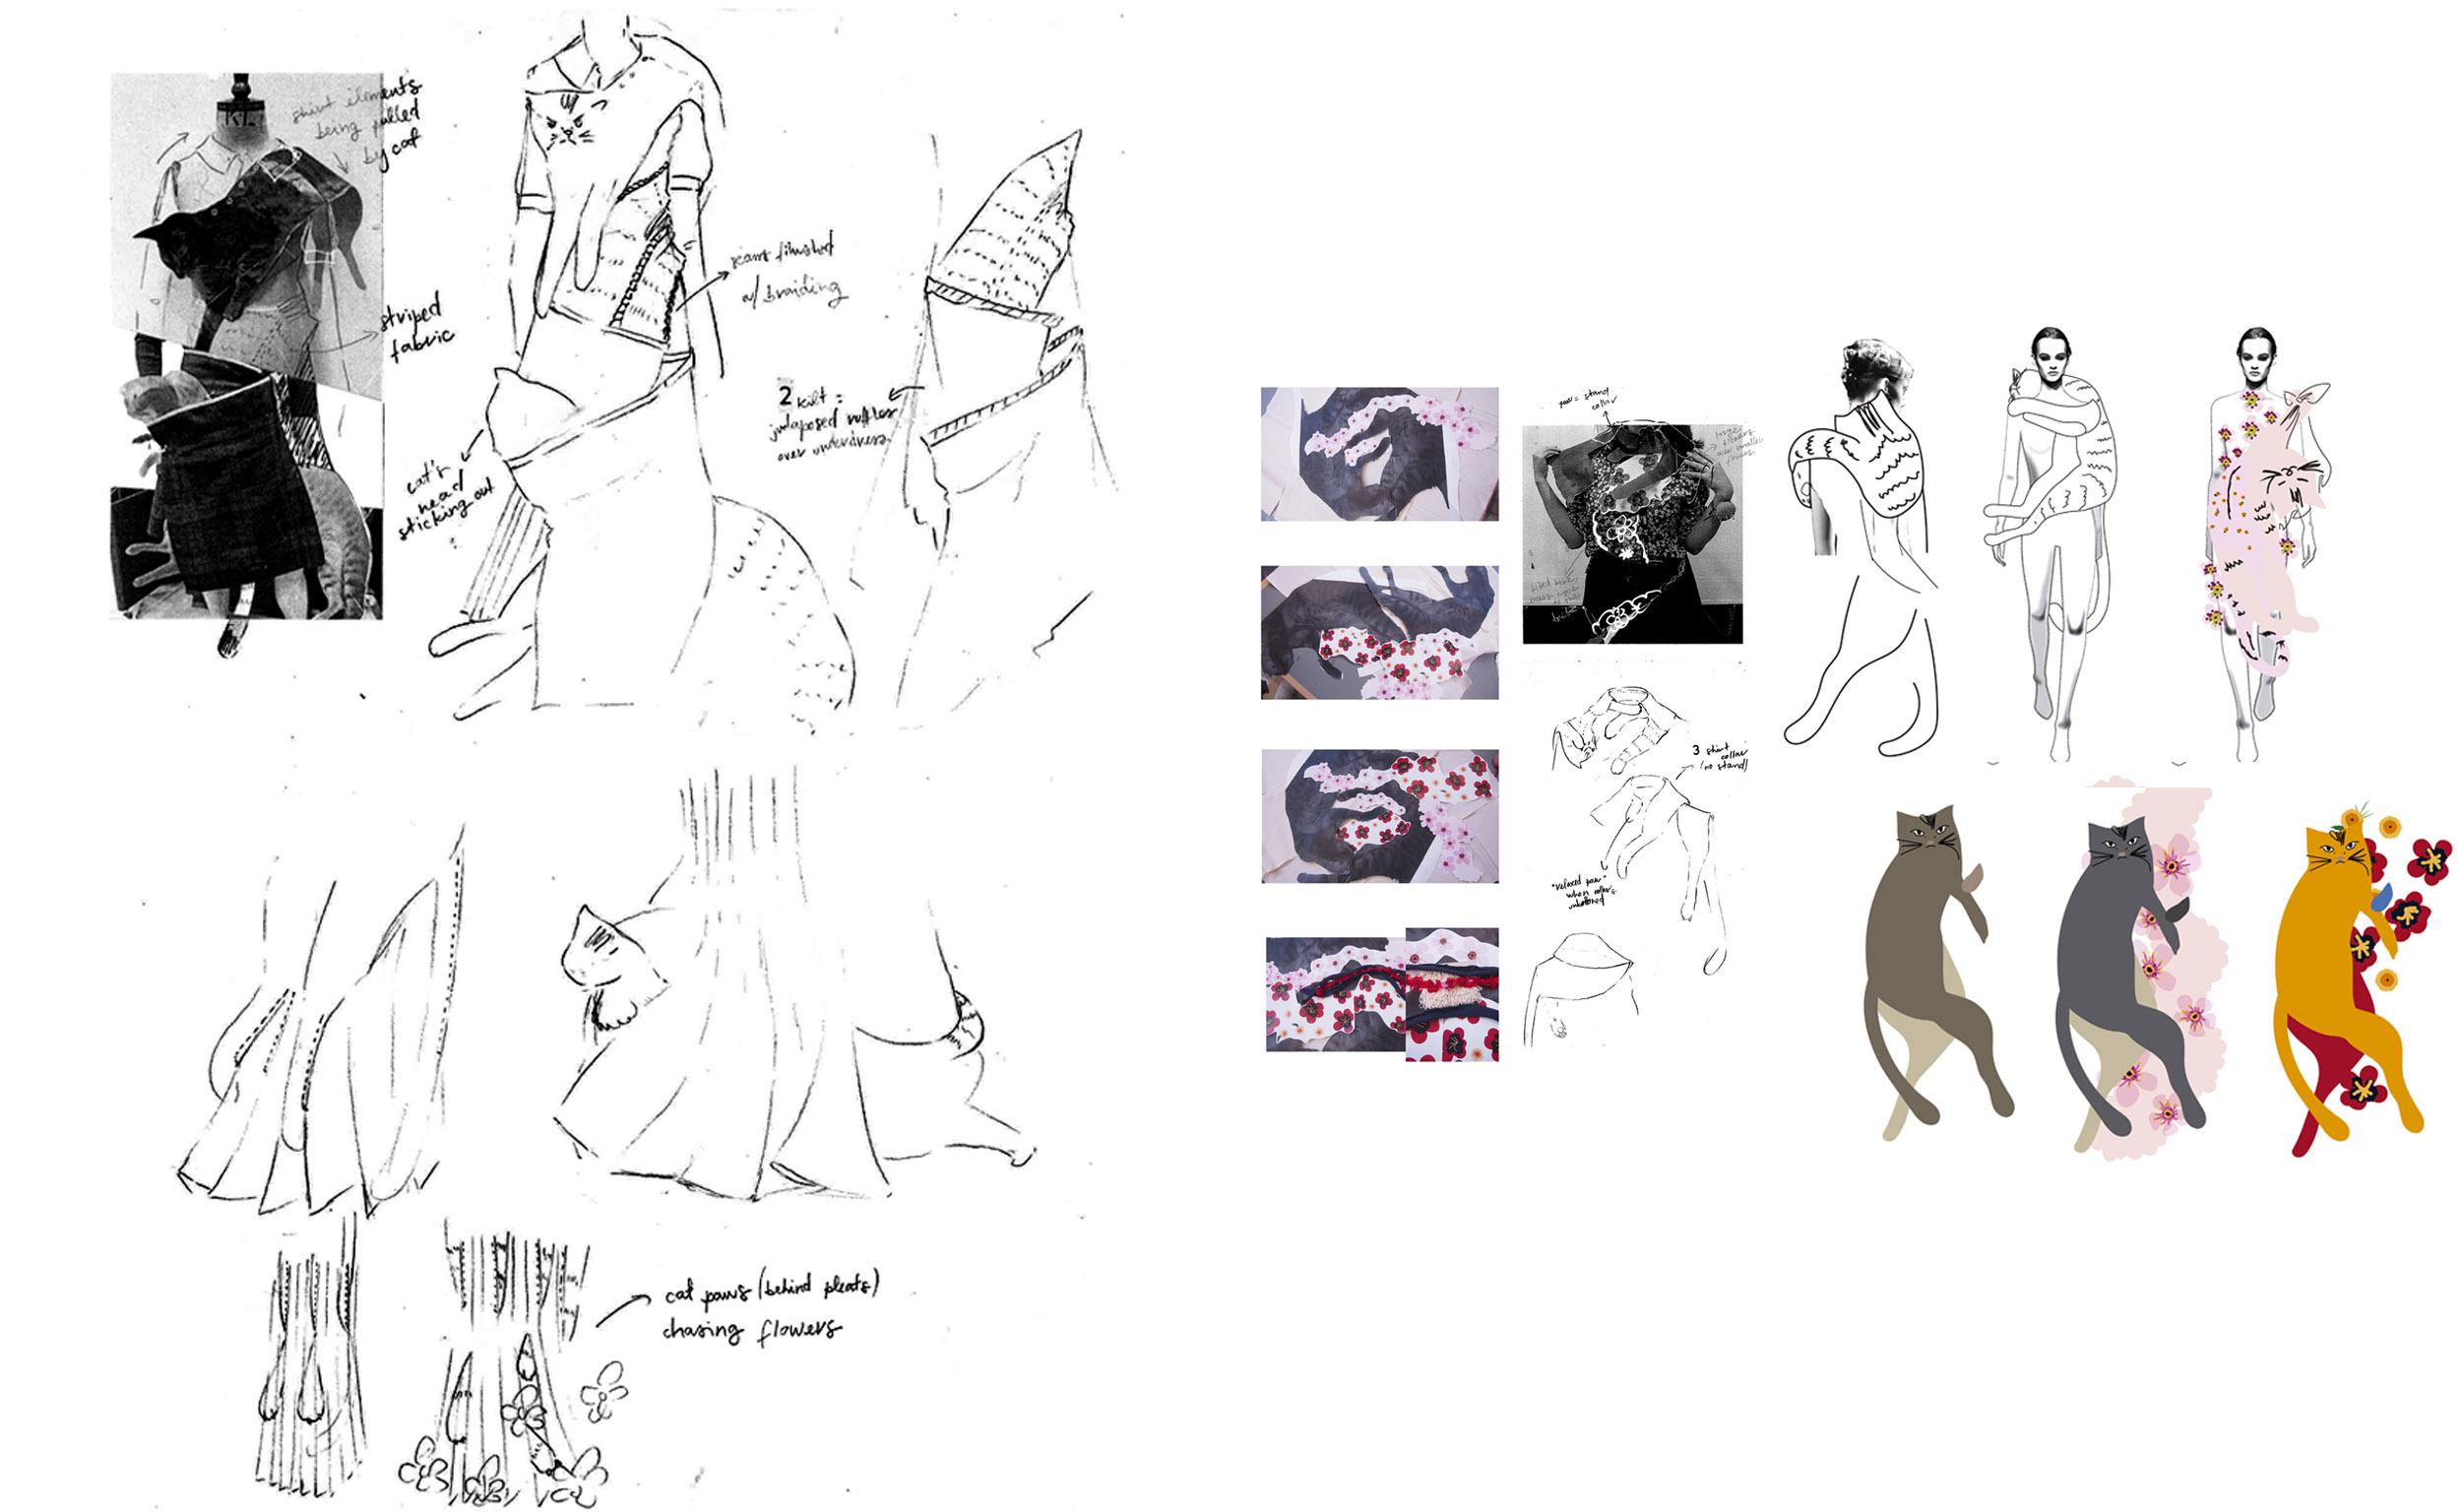 gallery-portfolio-project Me-development2.jpg